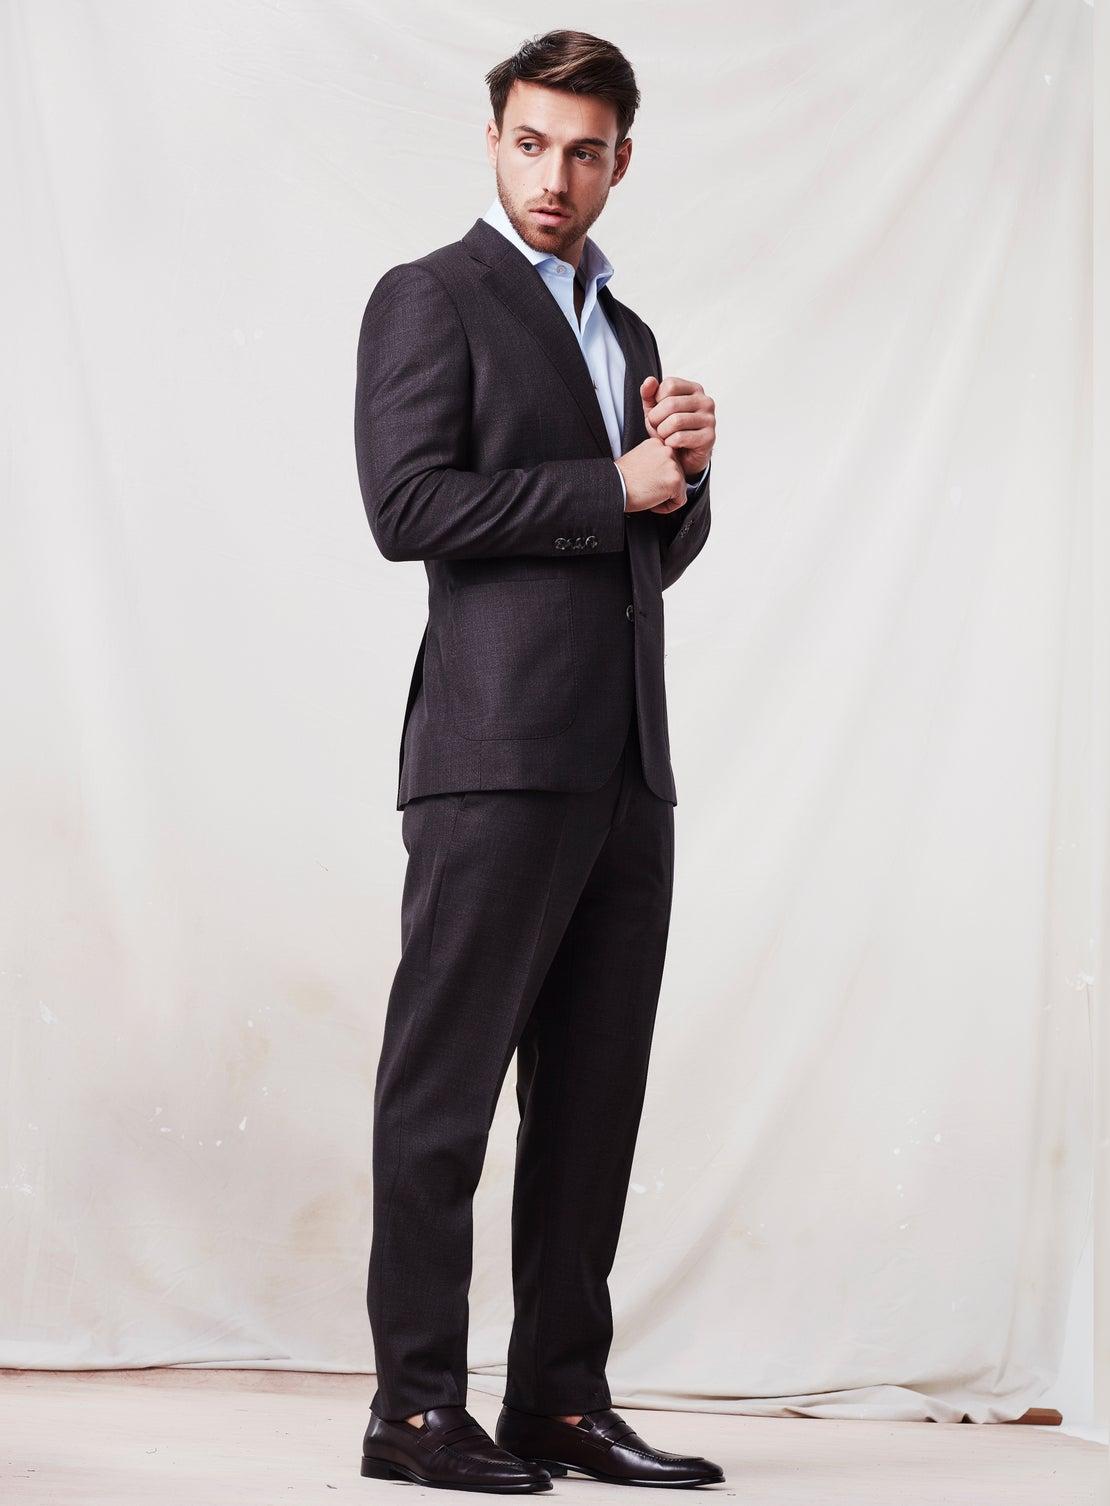 Textured Chocolate Suit